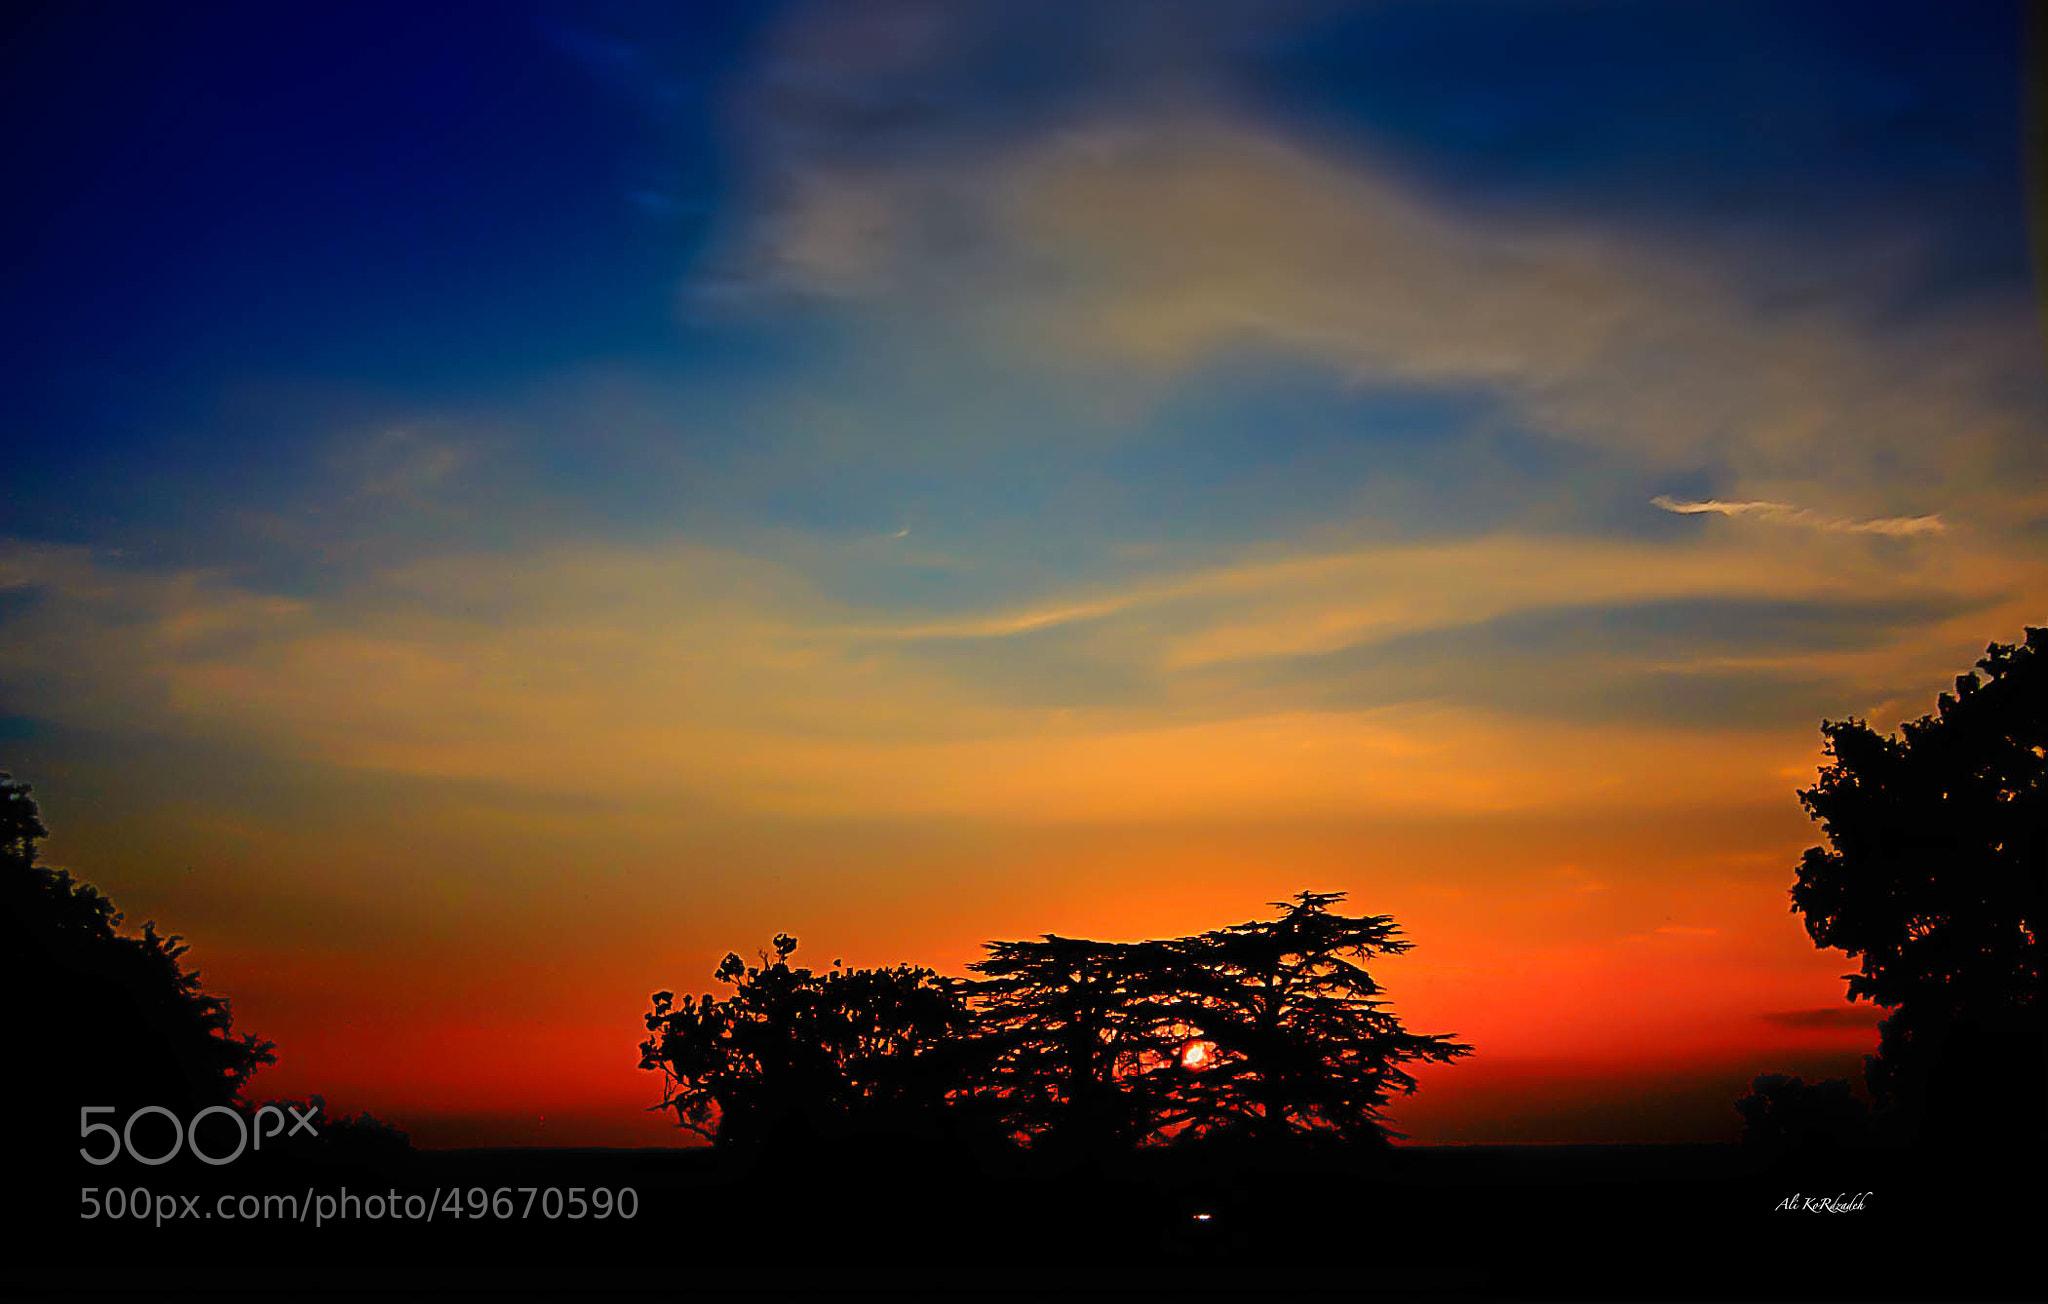 Photograph Akona Matata:) by Ali KoRdZaDeh on 500px